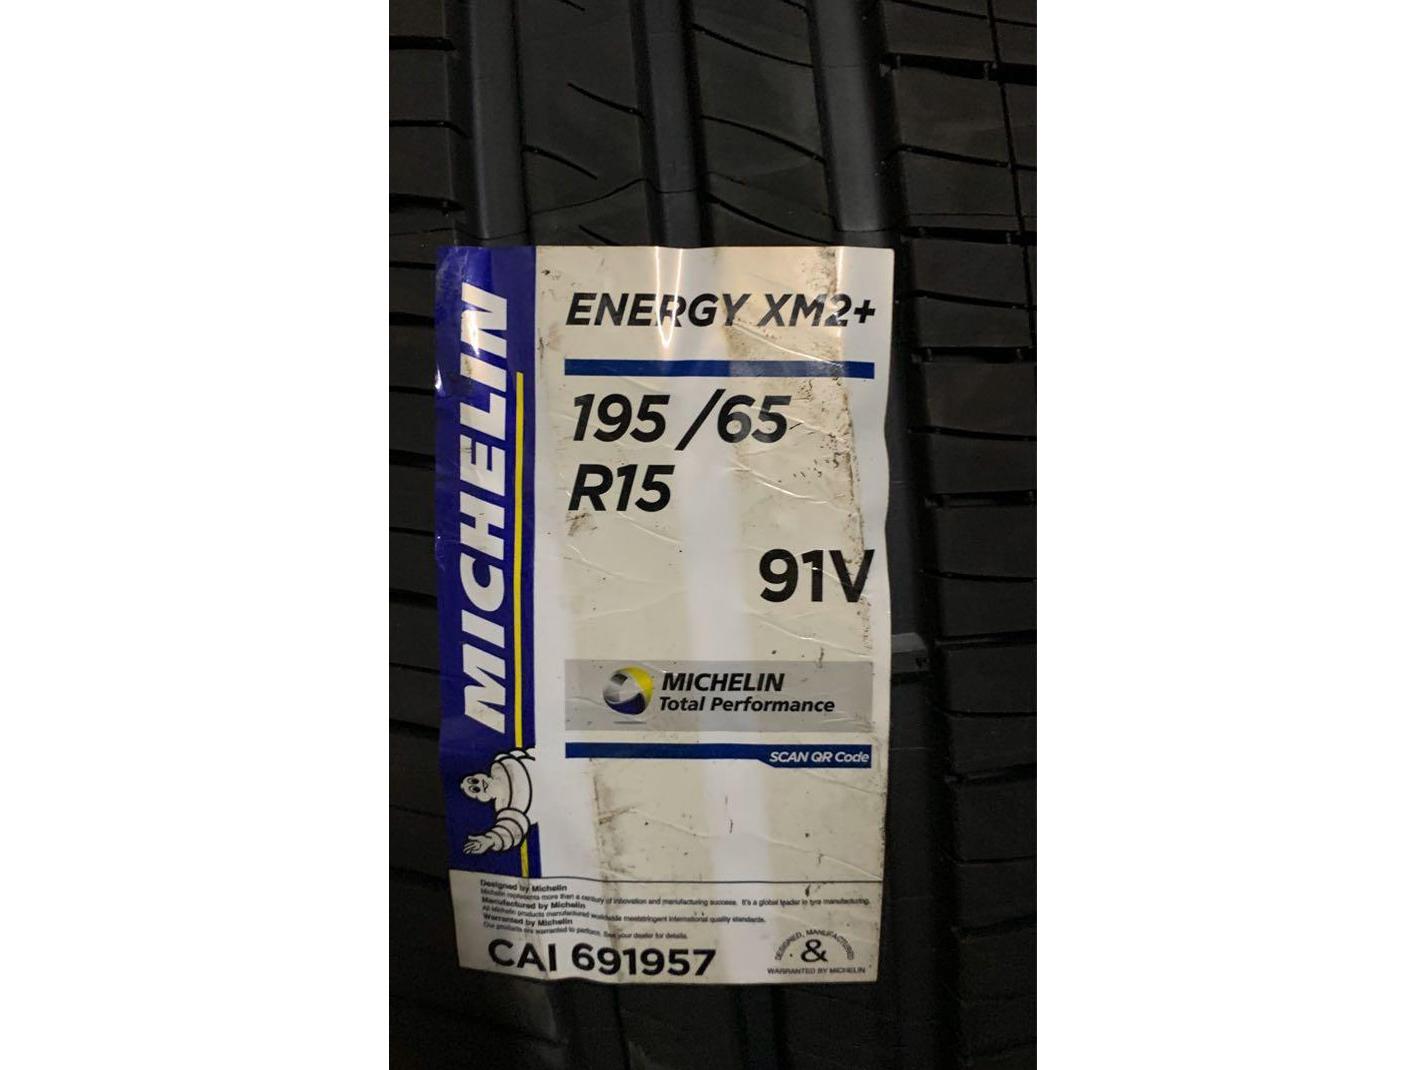 Michelin Energy XM2+ 195/65/R15 Tyre